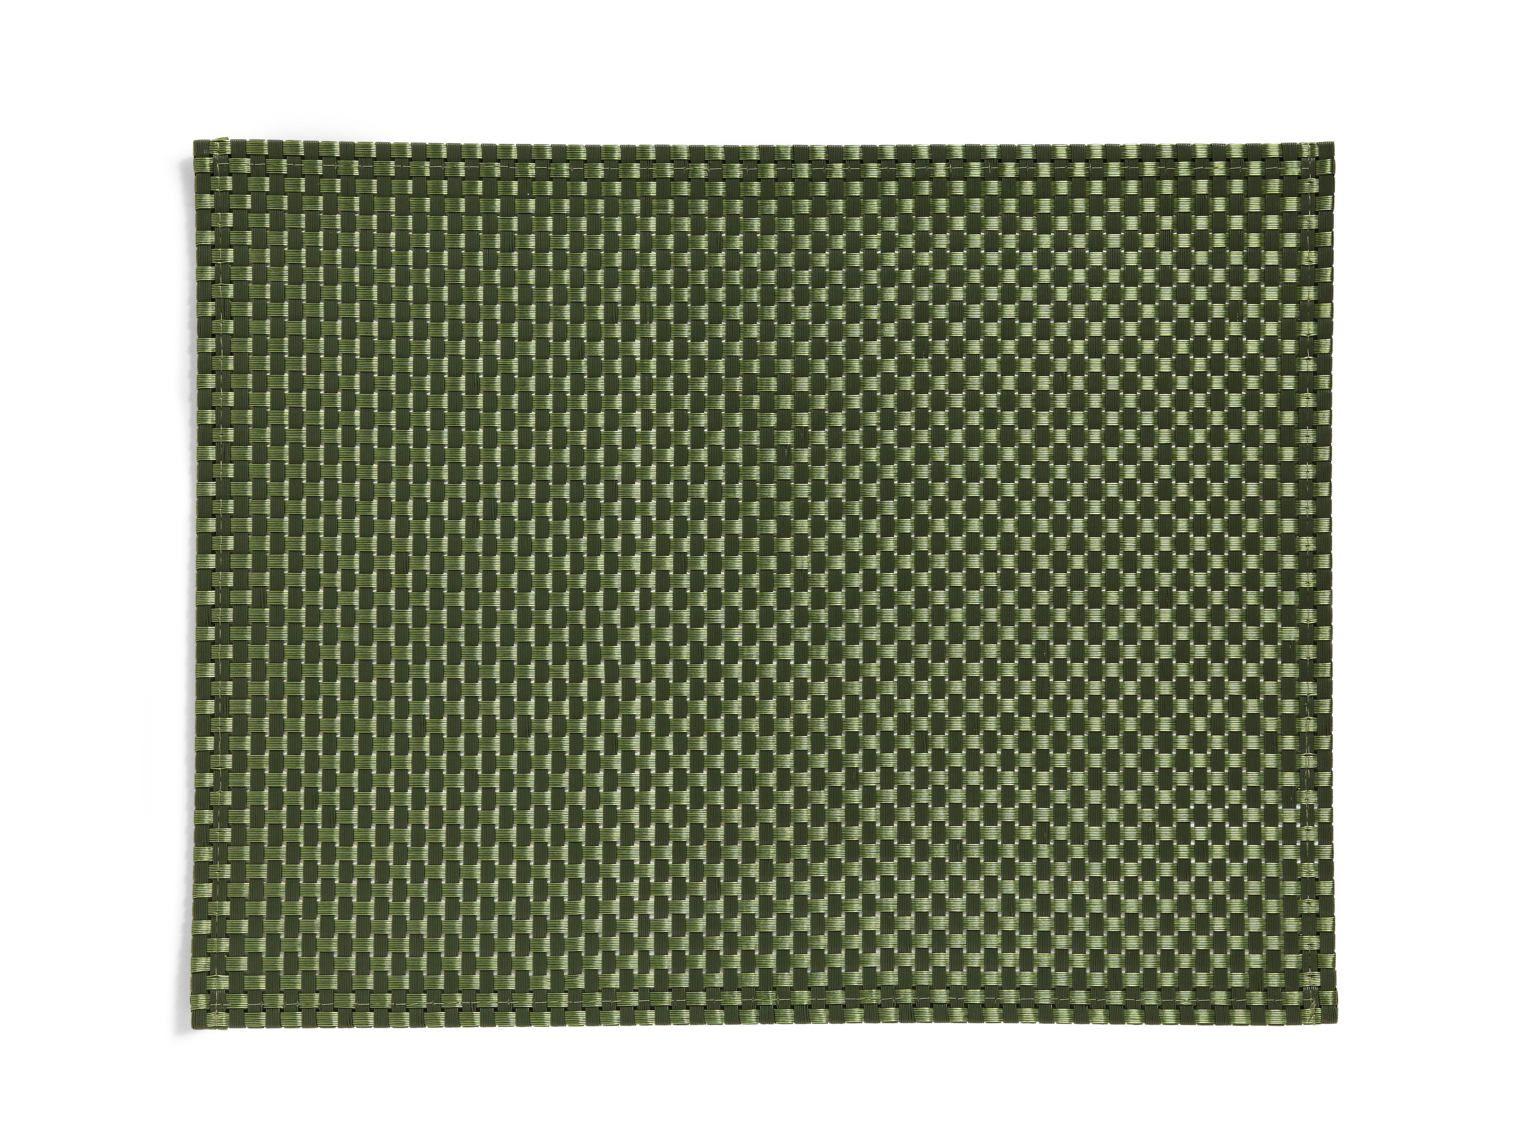 Jogo Americano 35x45 Tramado Especial Verde